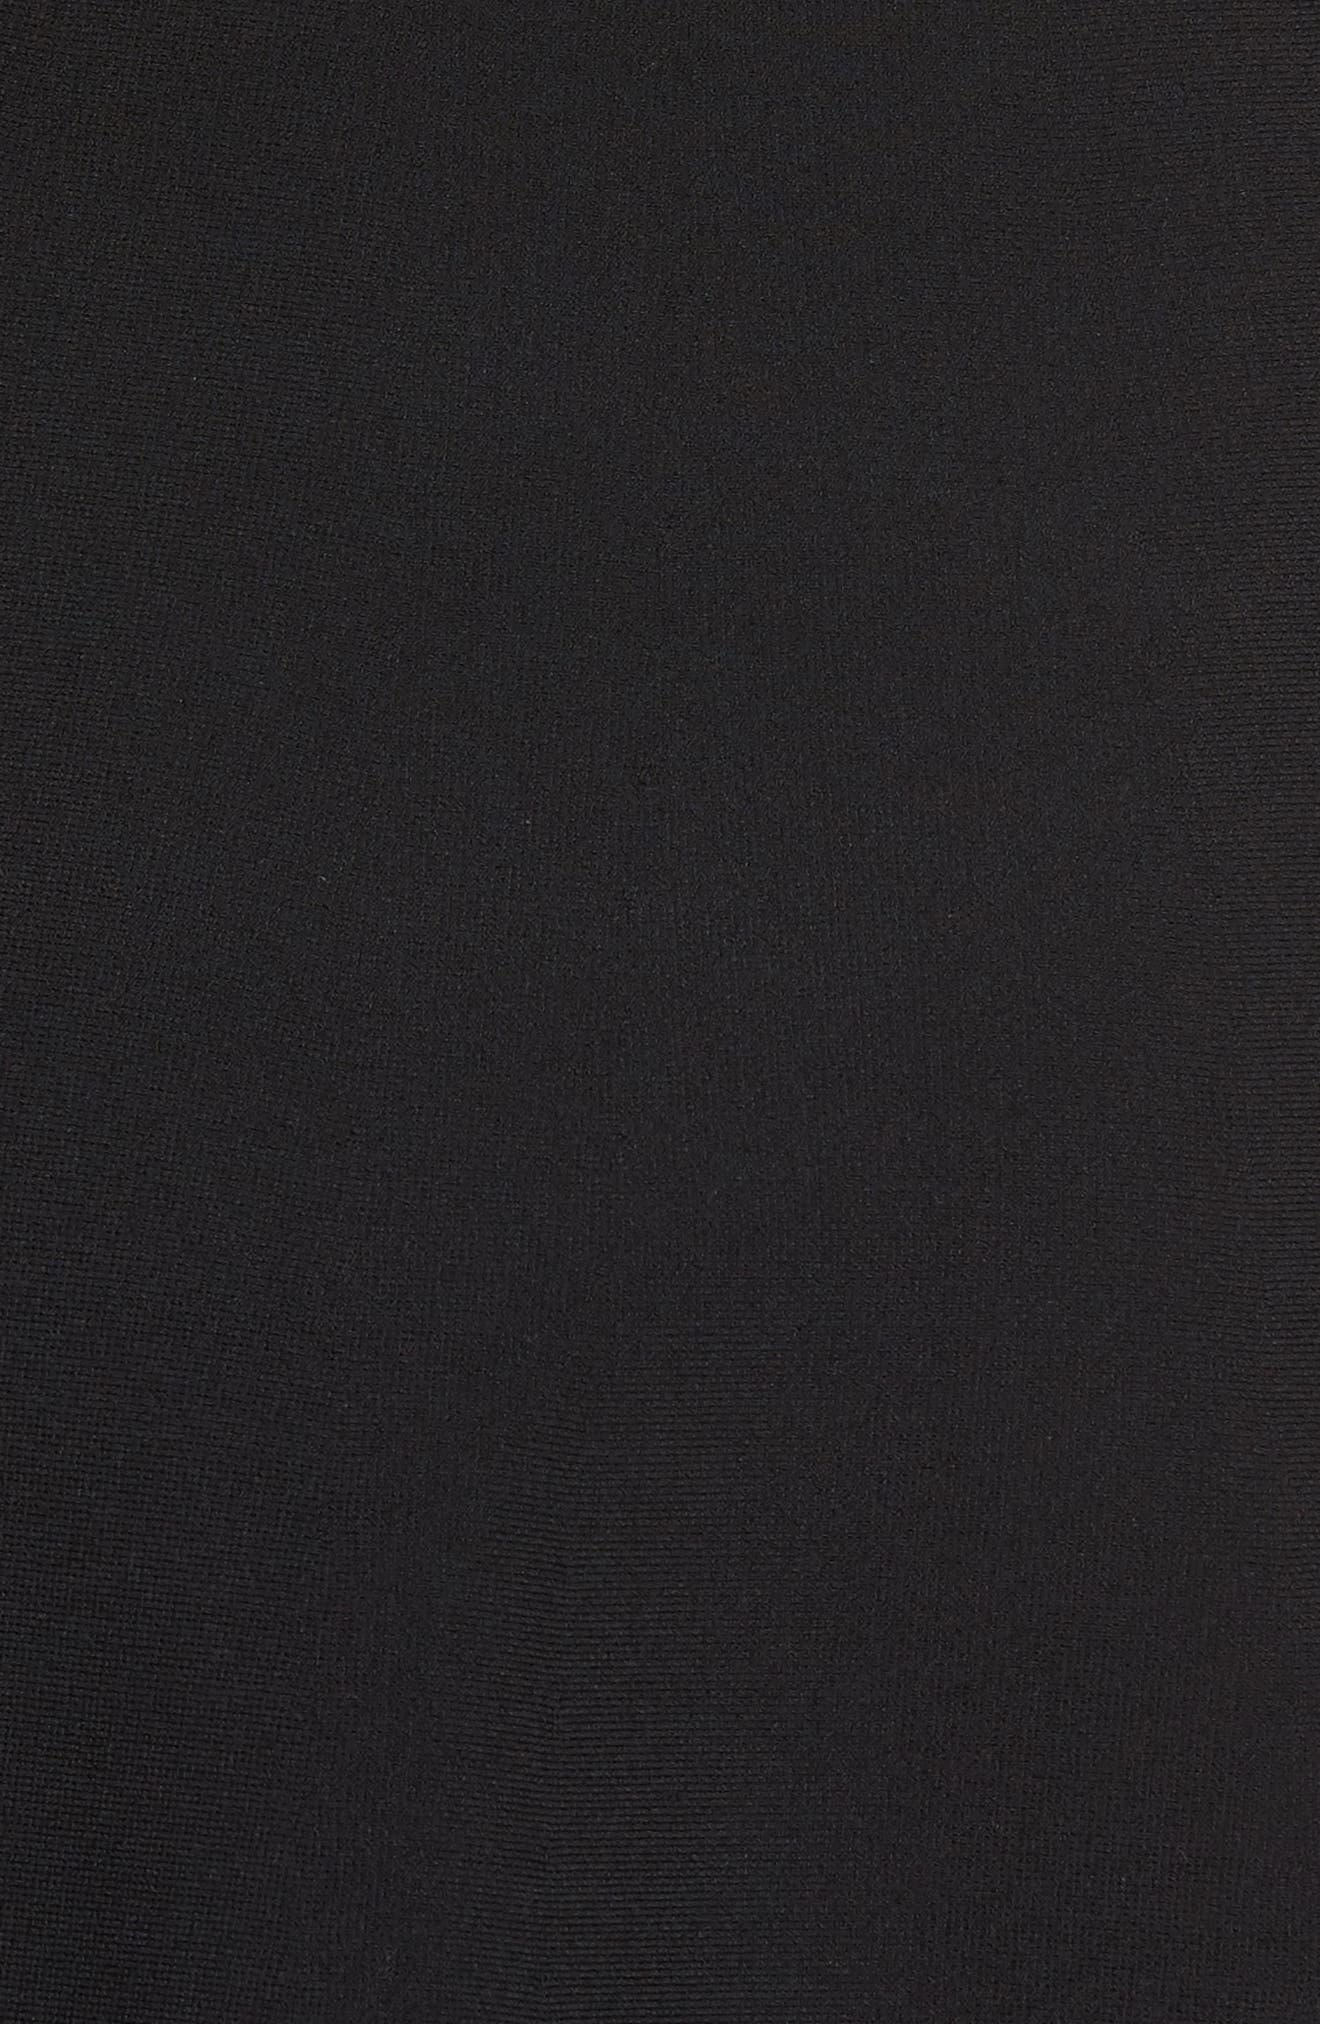 Sleeveless Fit & Flare Dress,                             Alternate thumbnail 5, color,                             001